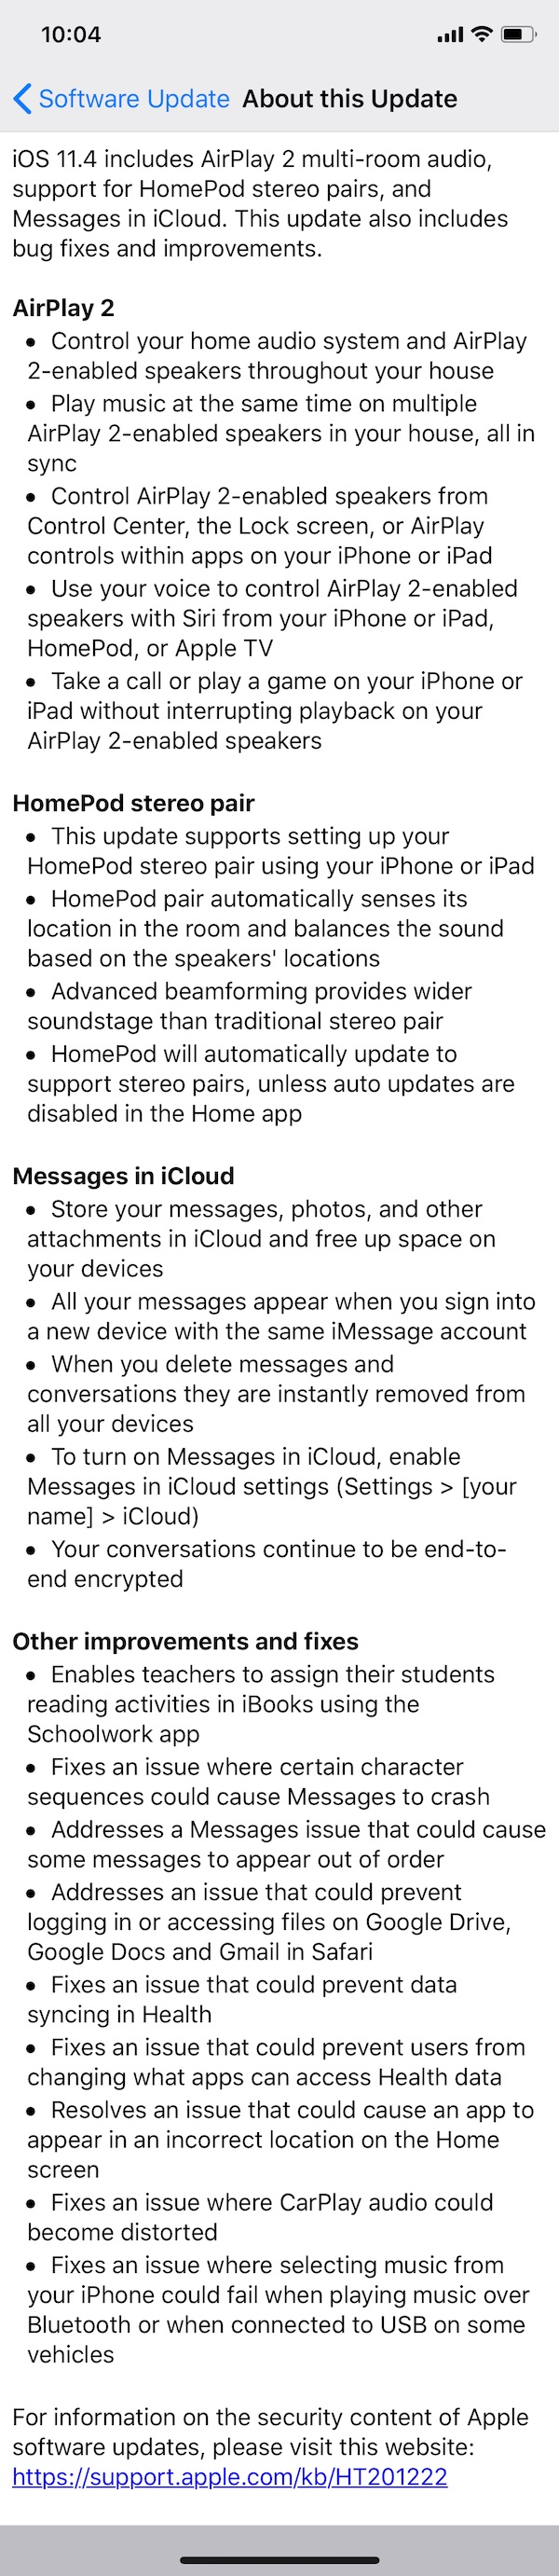 iOS 11.4 ChangeLog